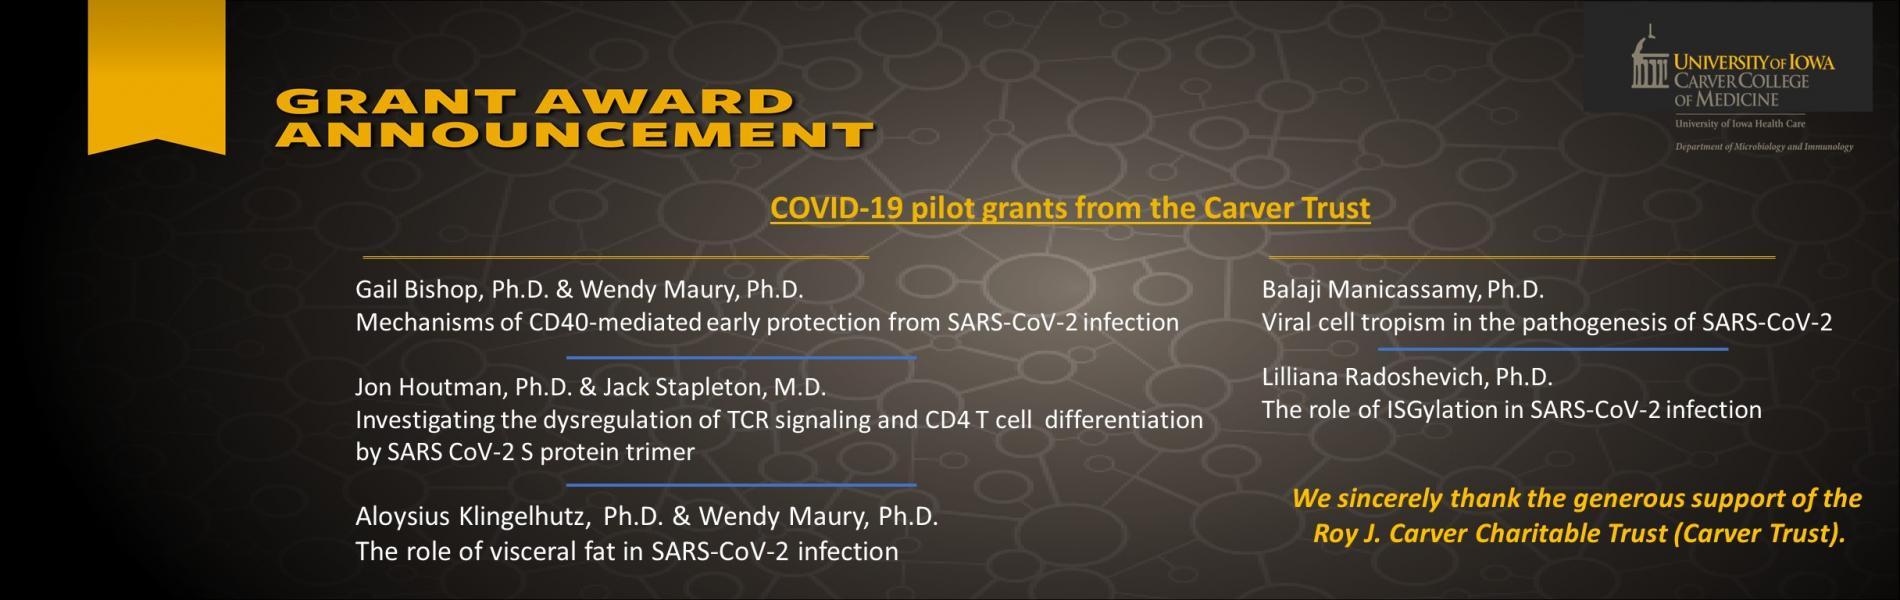 https://medicine.uiowa.edu/content/researchers-awarded-covid-19-pilot-grants-carver-trust